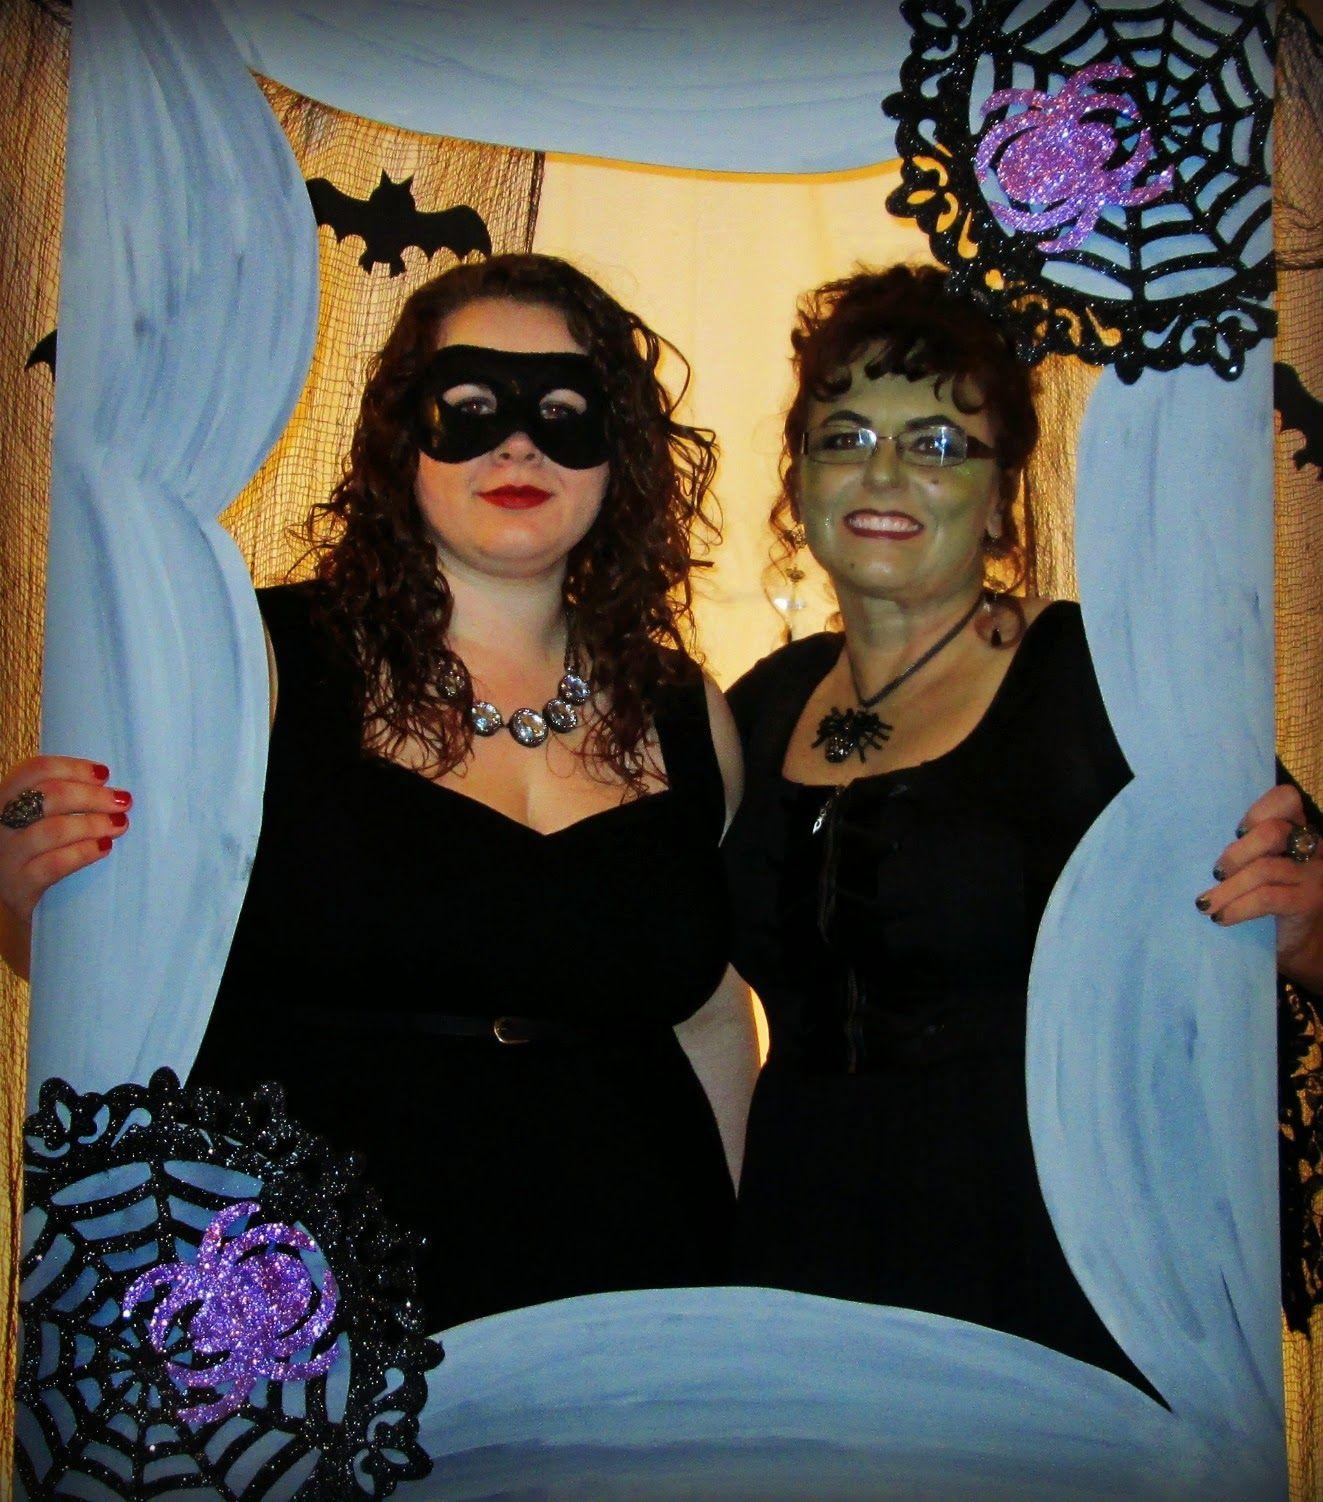 Make Halloween Booth Frame 22x48